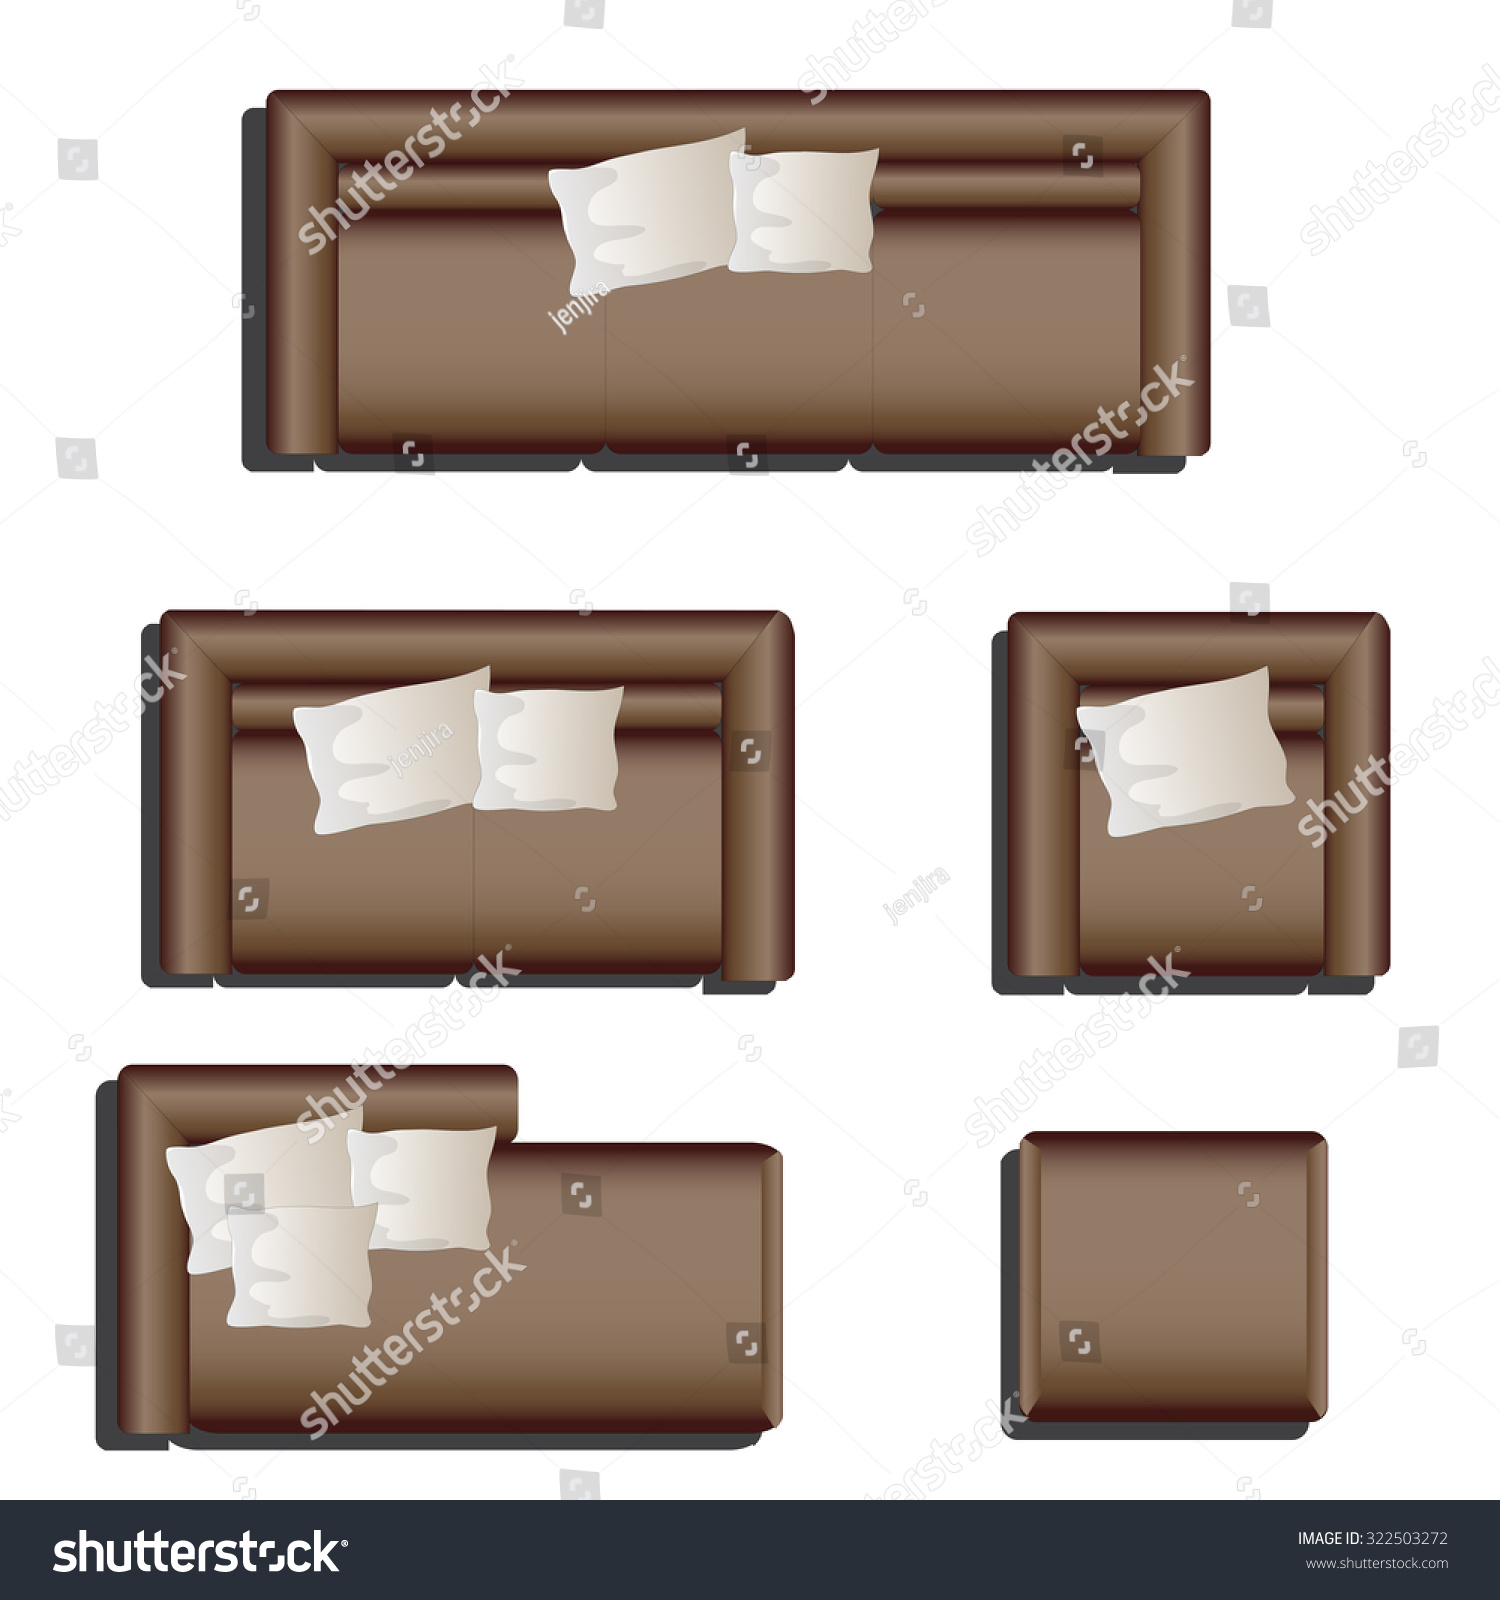 http://image.shutterstock.com/z/stock-vector-furniture-top-view-set-for-interior-vector-illustration-brown-sofa-322503272.jpg